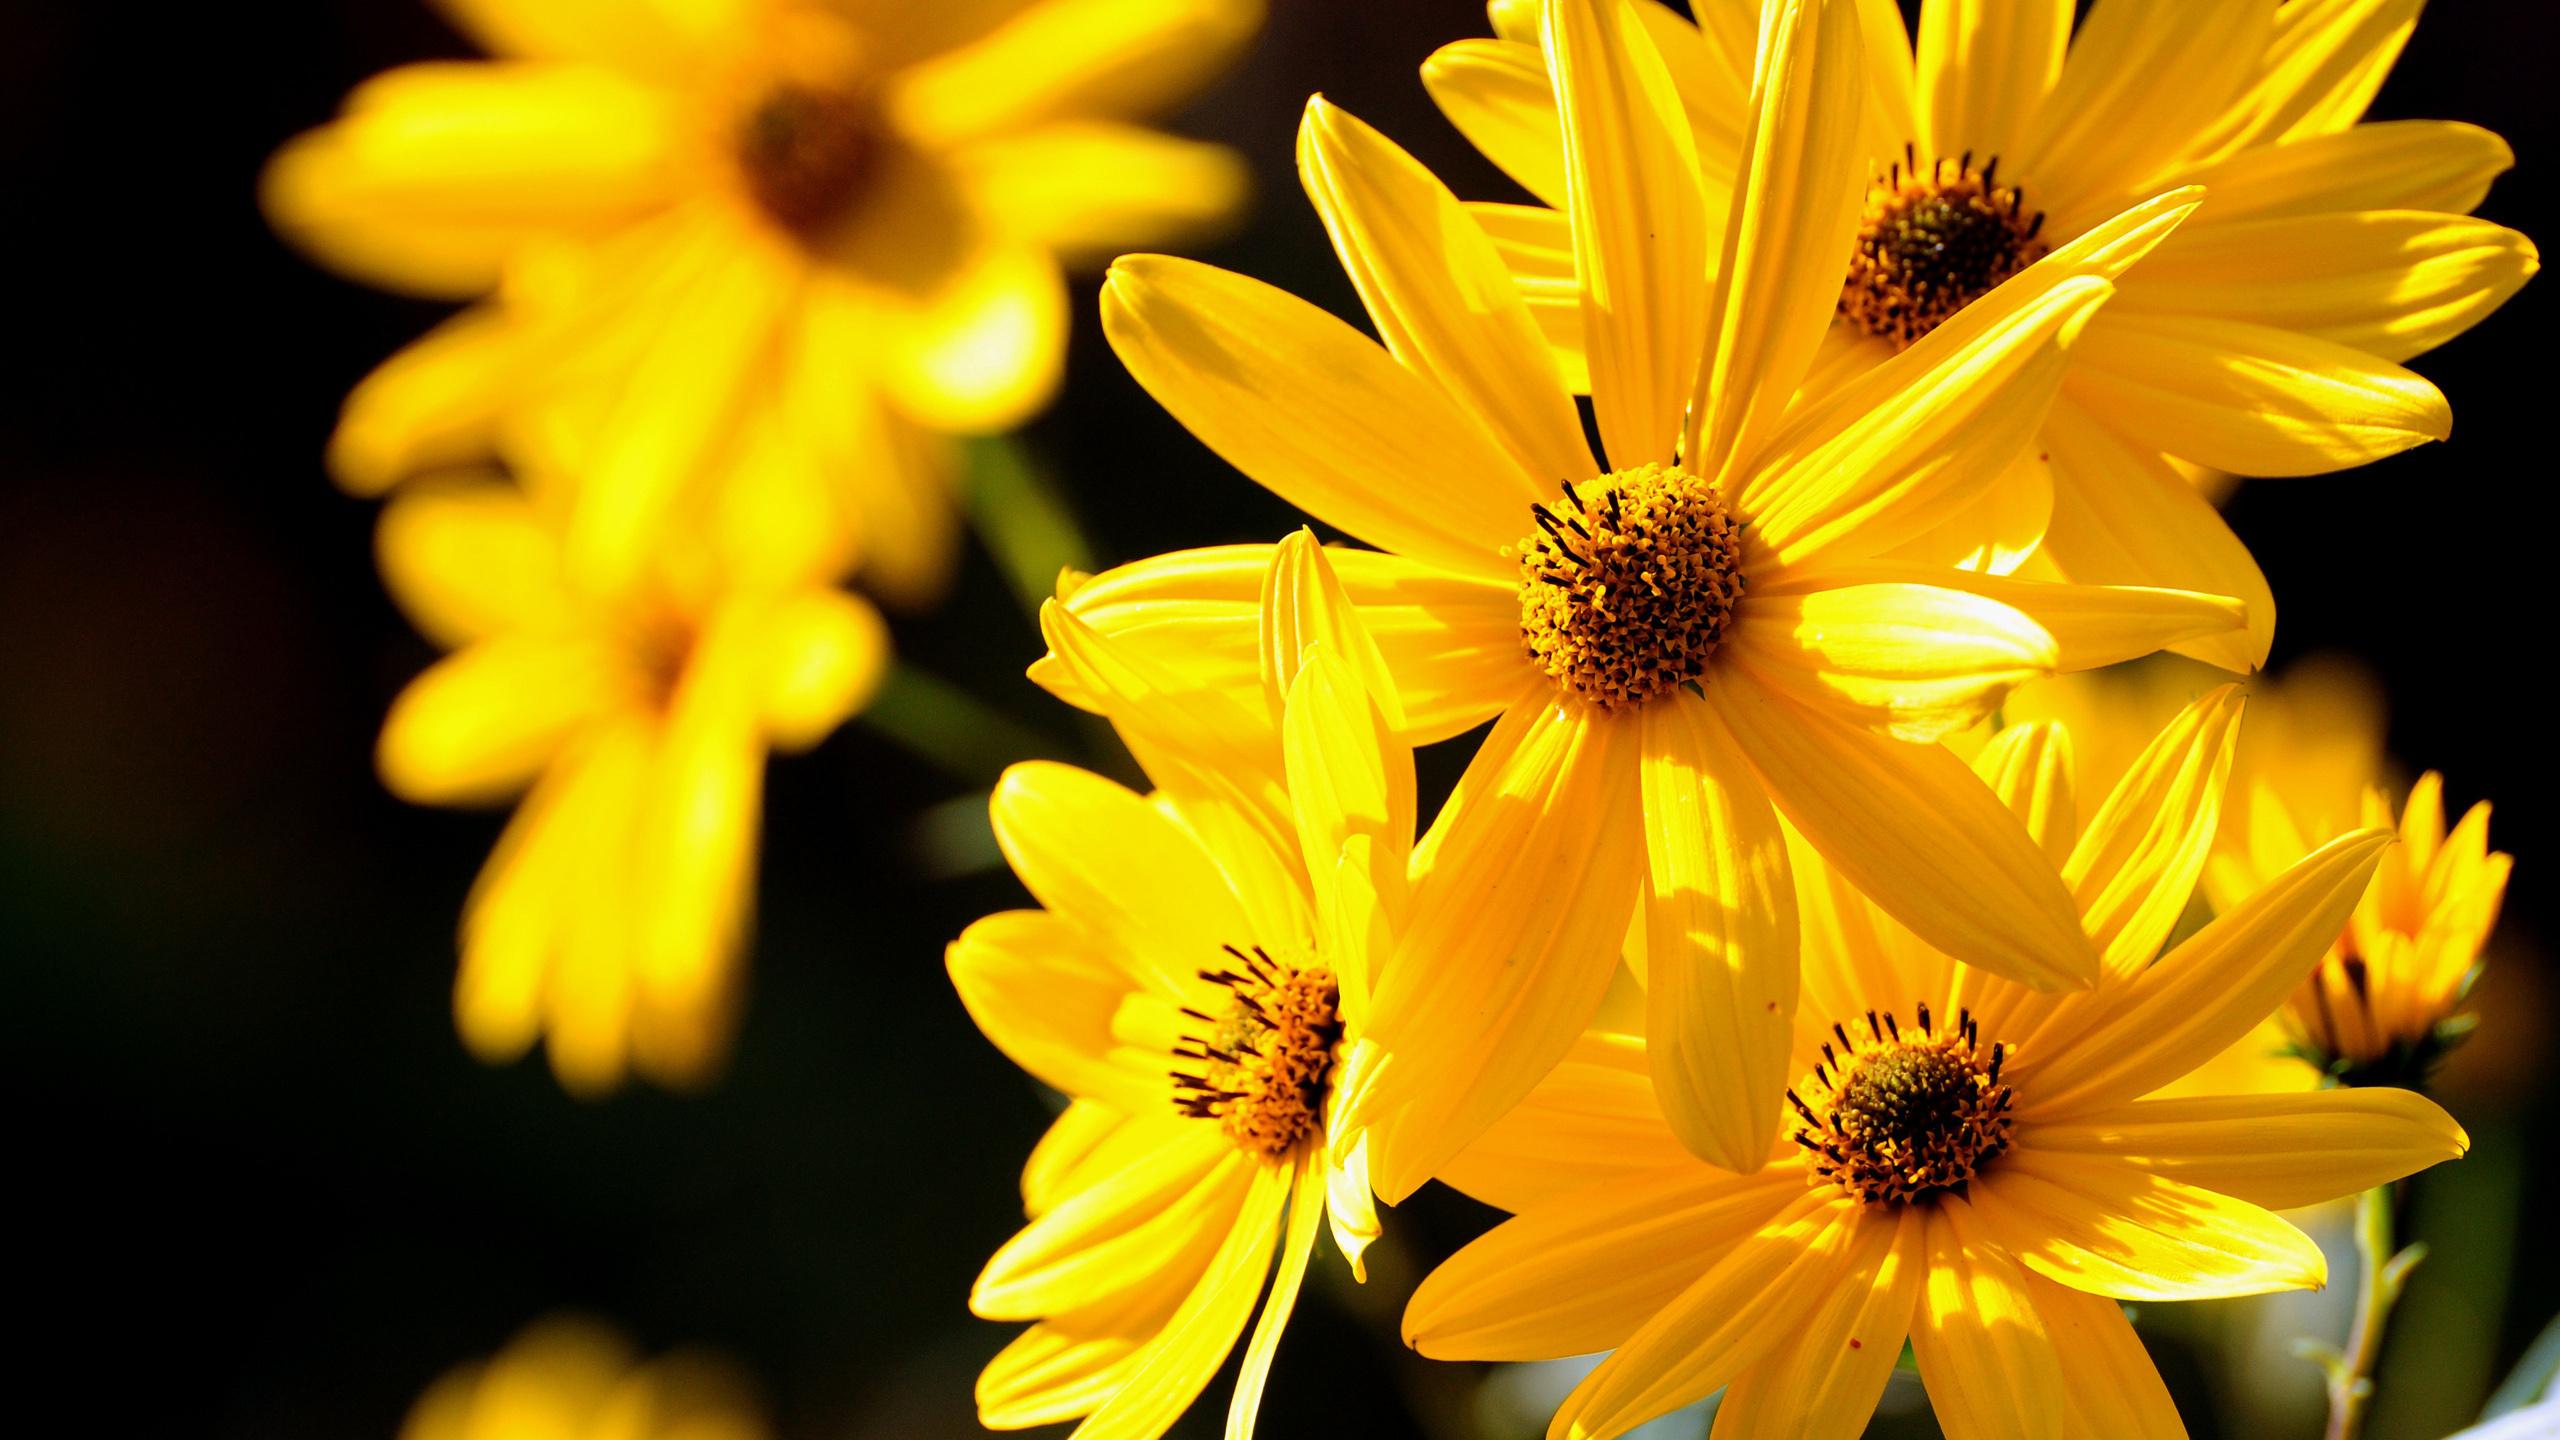 Картинки красивые желтые цветы